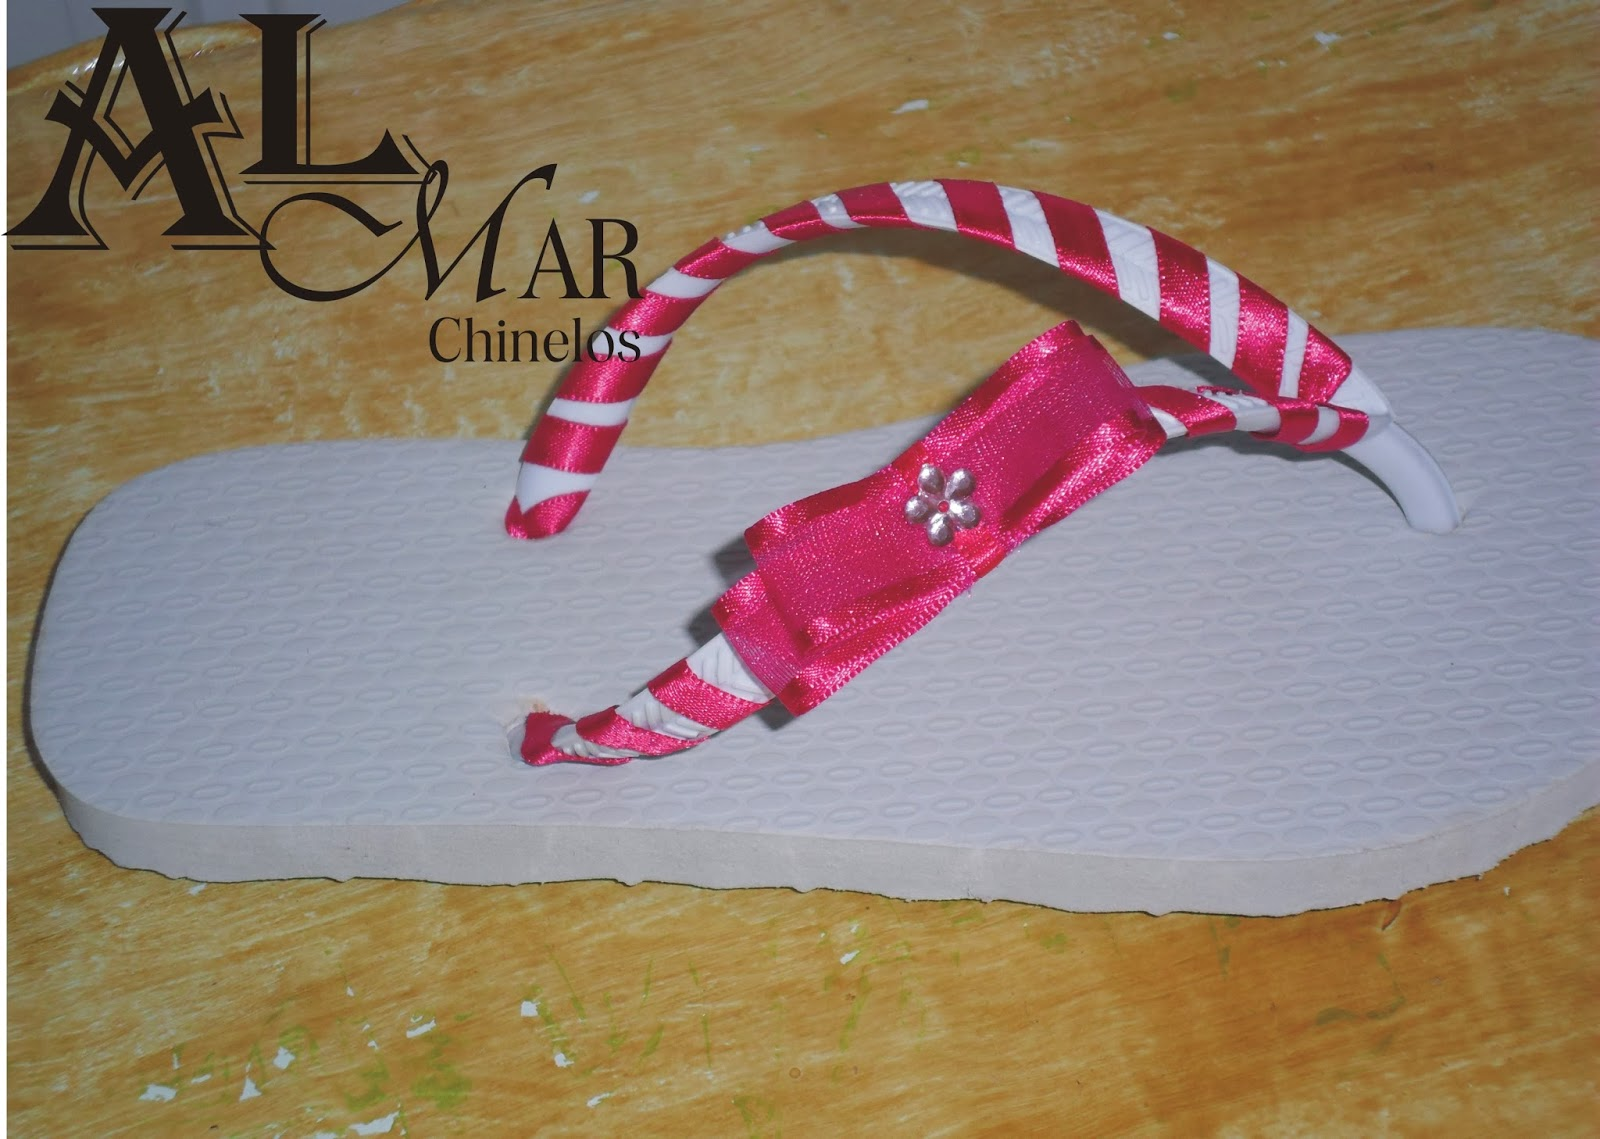 042e2d40b2 Chinelos Personalizados Al Mar Chinelos  Chinelos Personalizados com ...